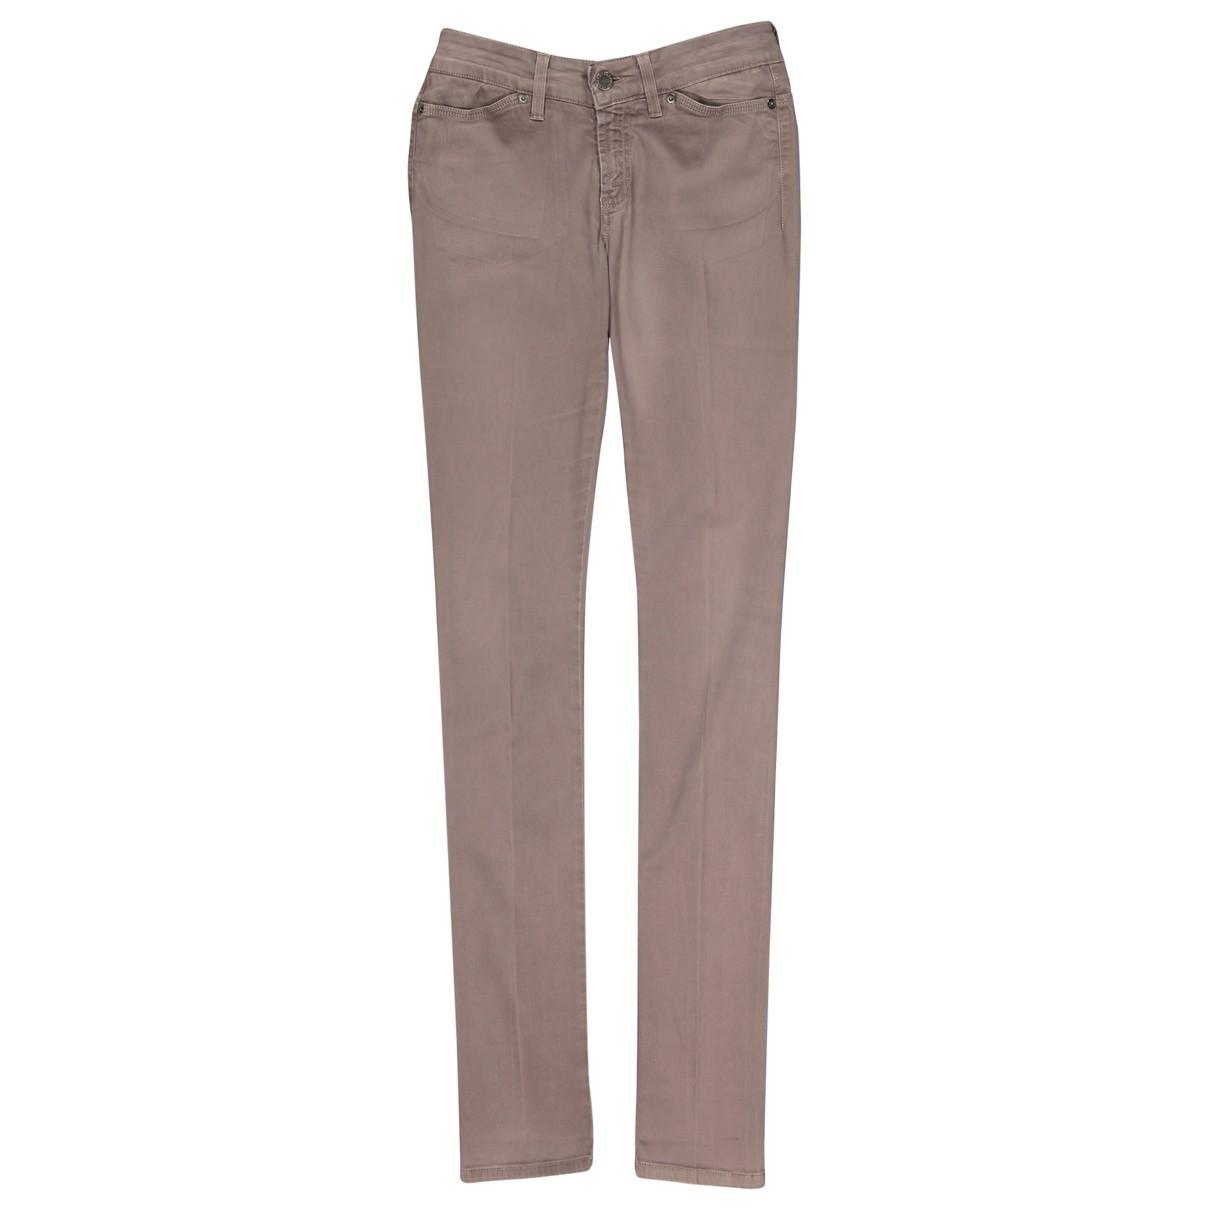 Stella Mccartney \N Grey Cotton - elasthane Jeans for Women 26 US